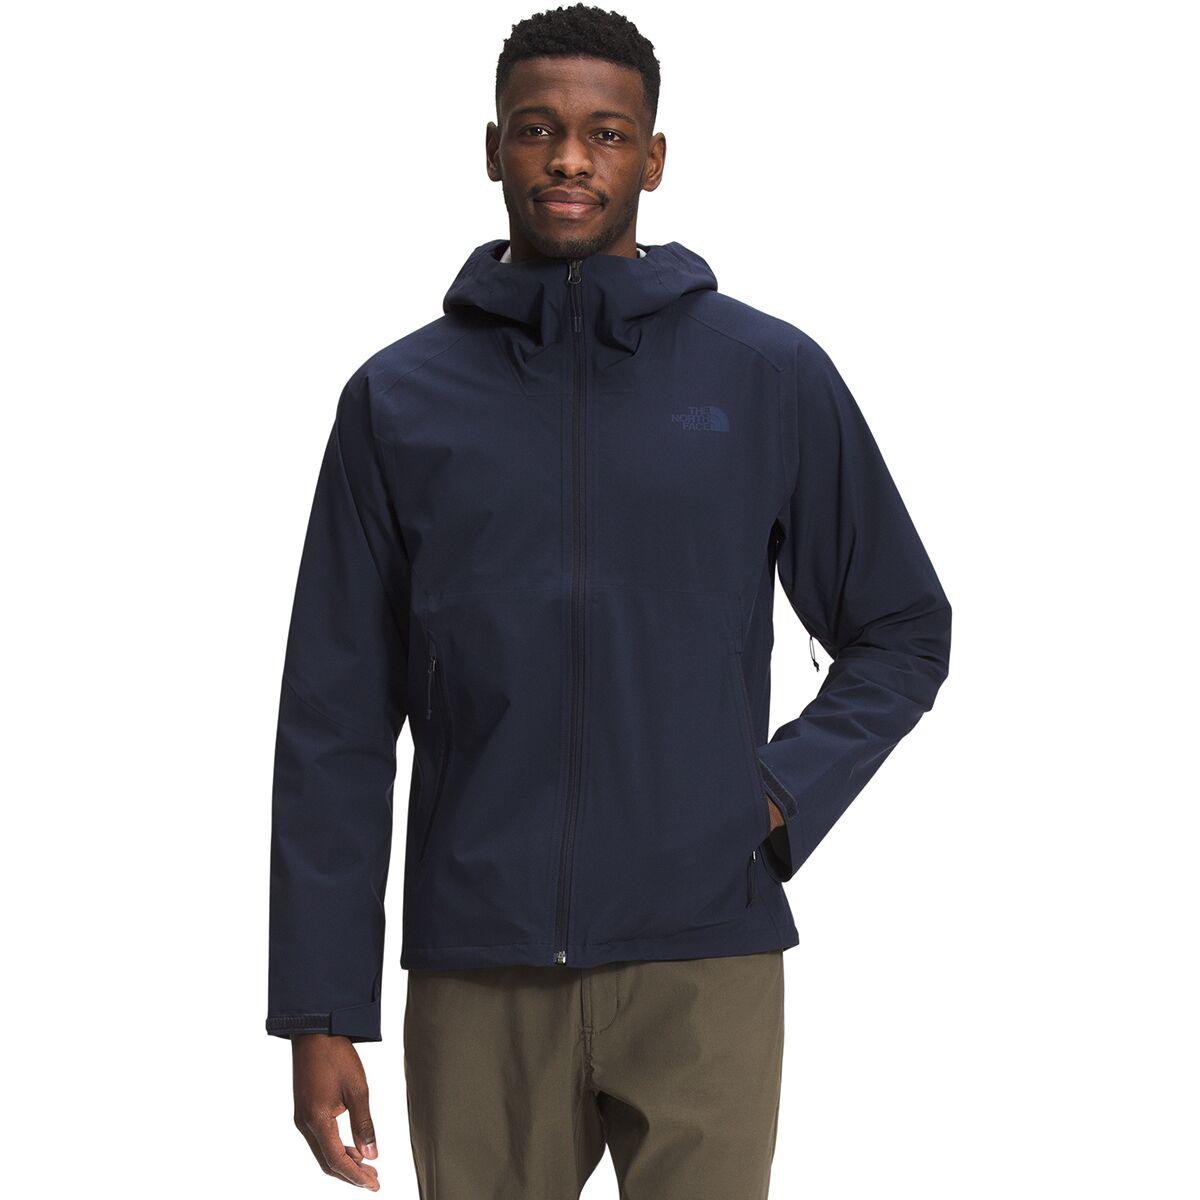 Allproof Stretch Jacket - Men